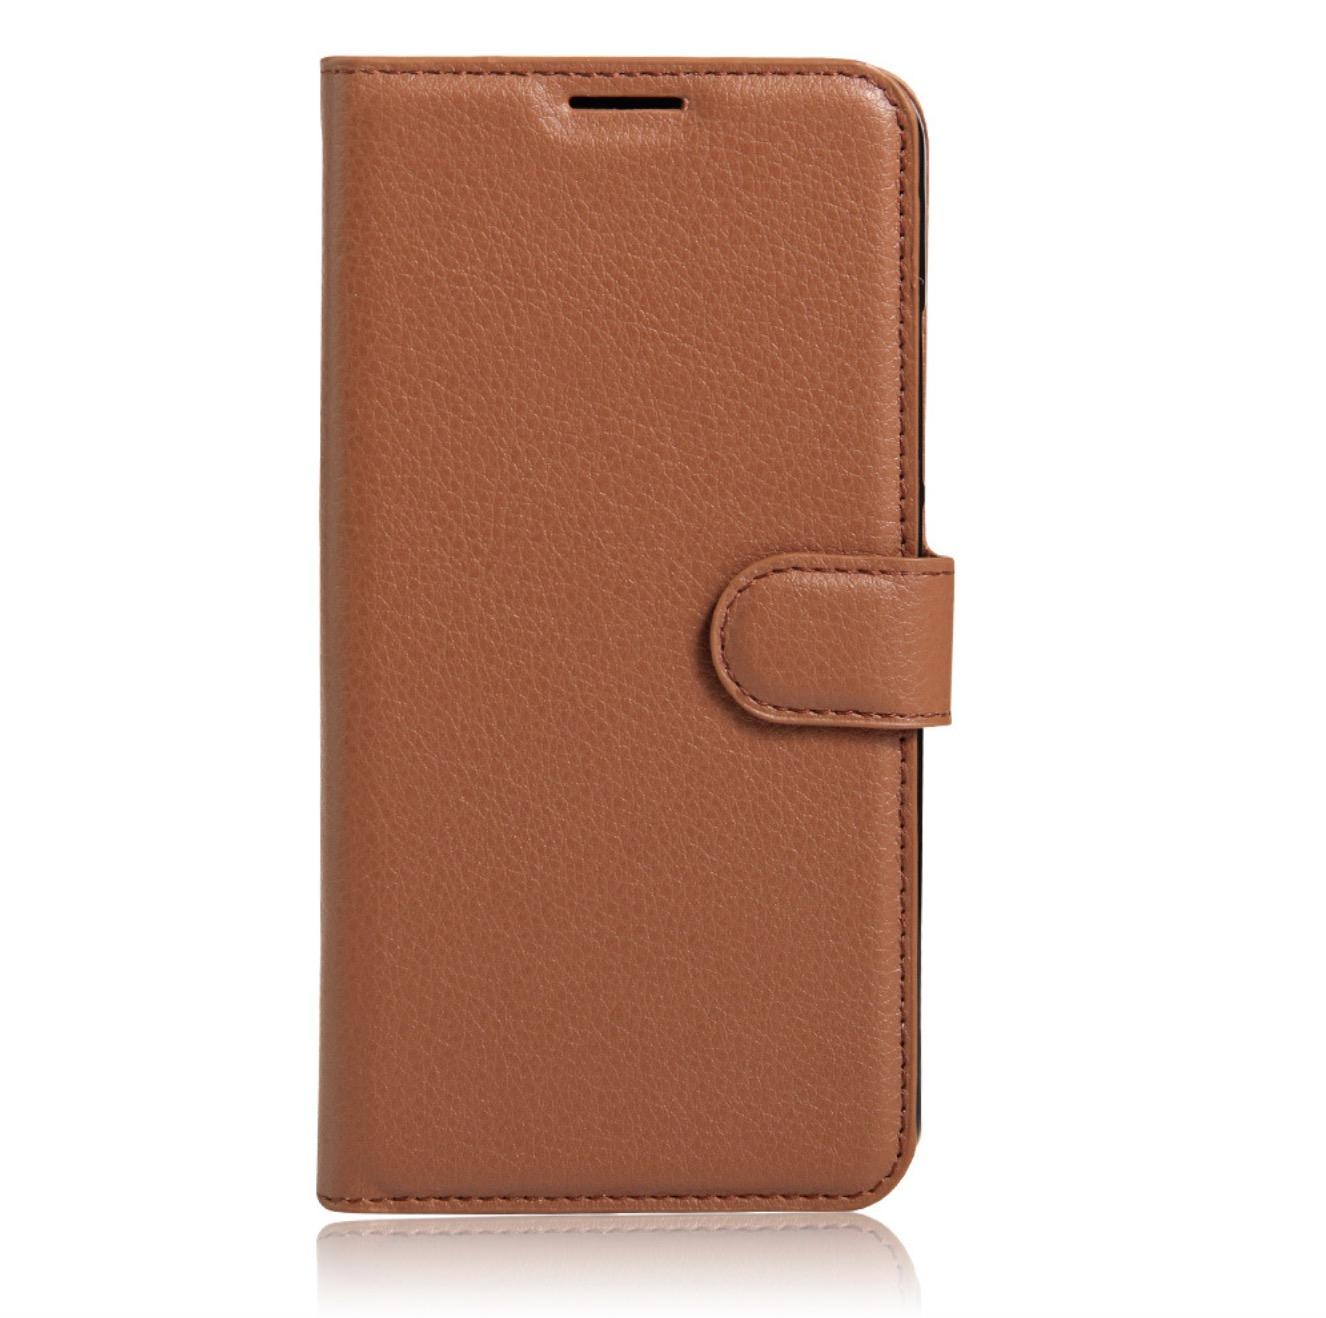 Чехол MyPads для Sony Xperia Z5 / Z5 Dual Sim E6603/E6633 Brown